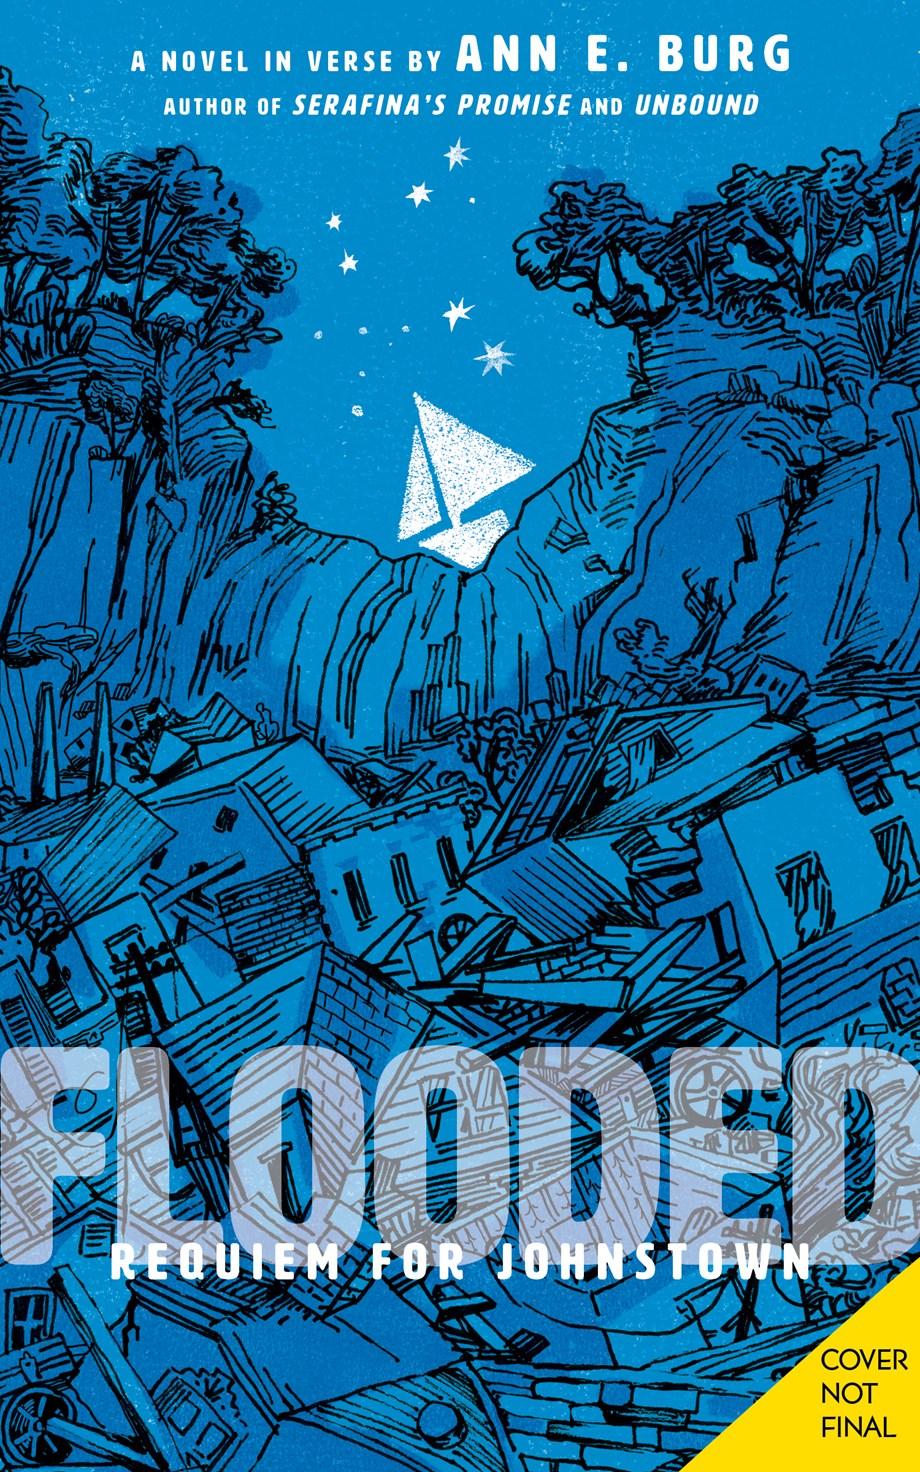 Flooded: Requiem for Johnstown by Ann E. Burg